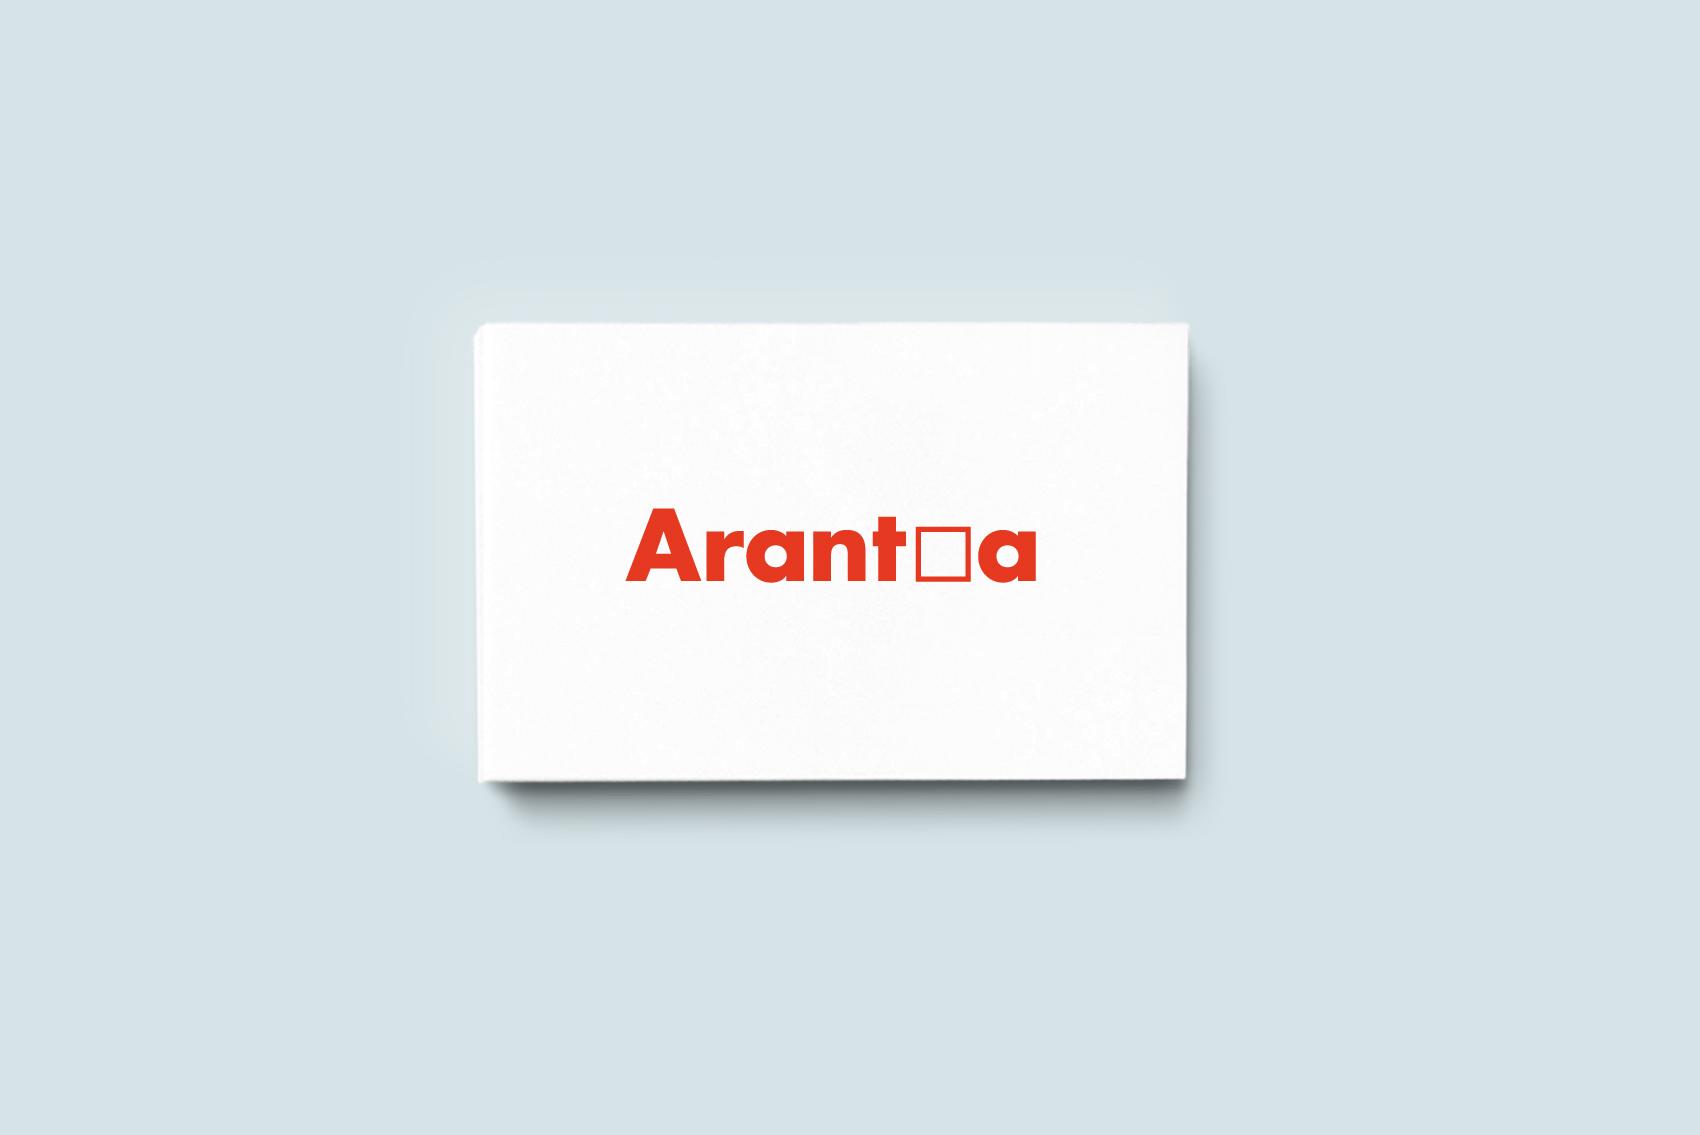 Arantxa1c